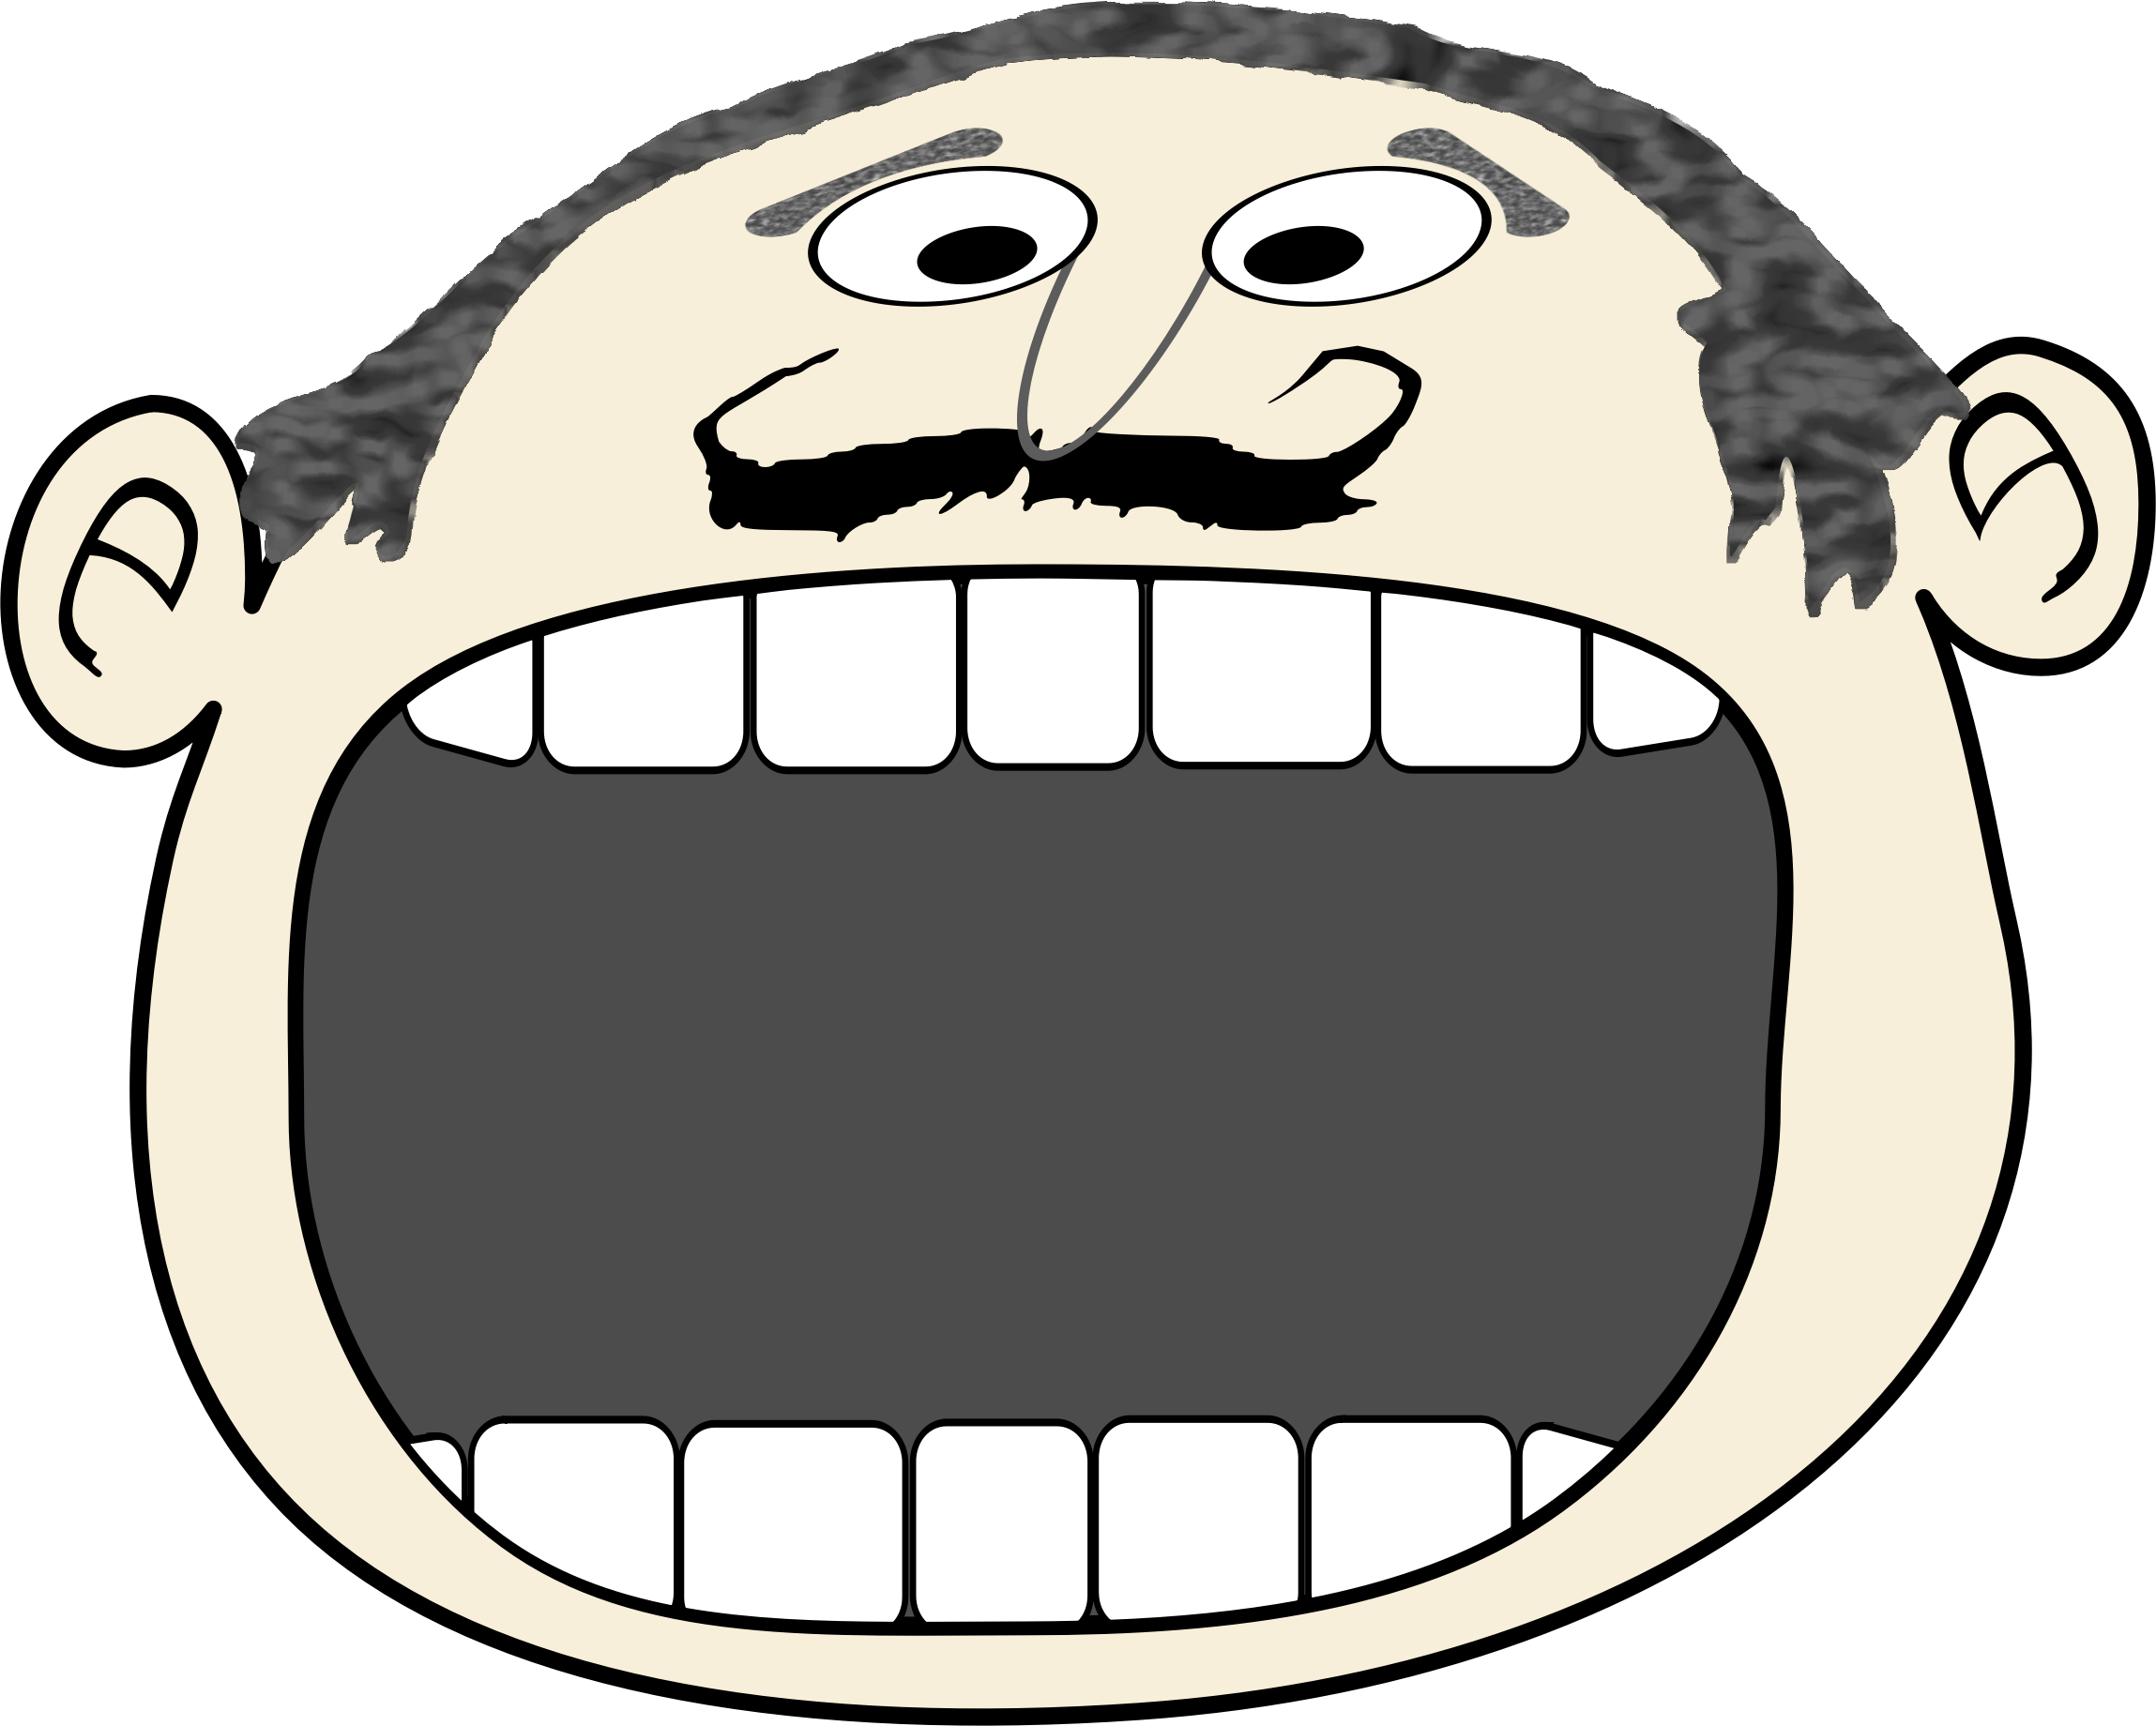 Mouth clipart speech. Cartoon announce big image